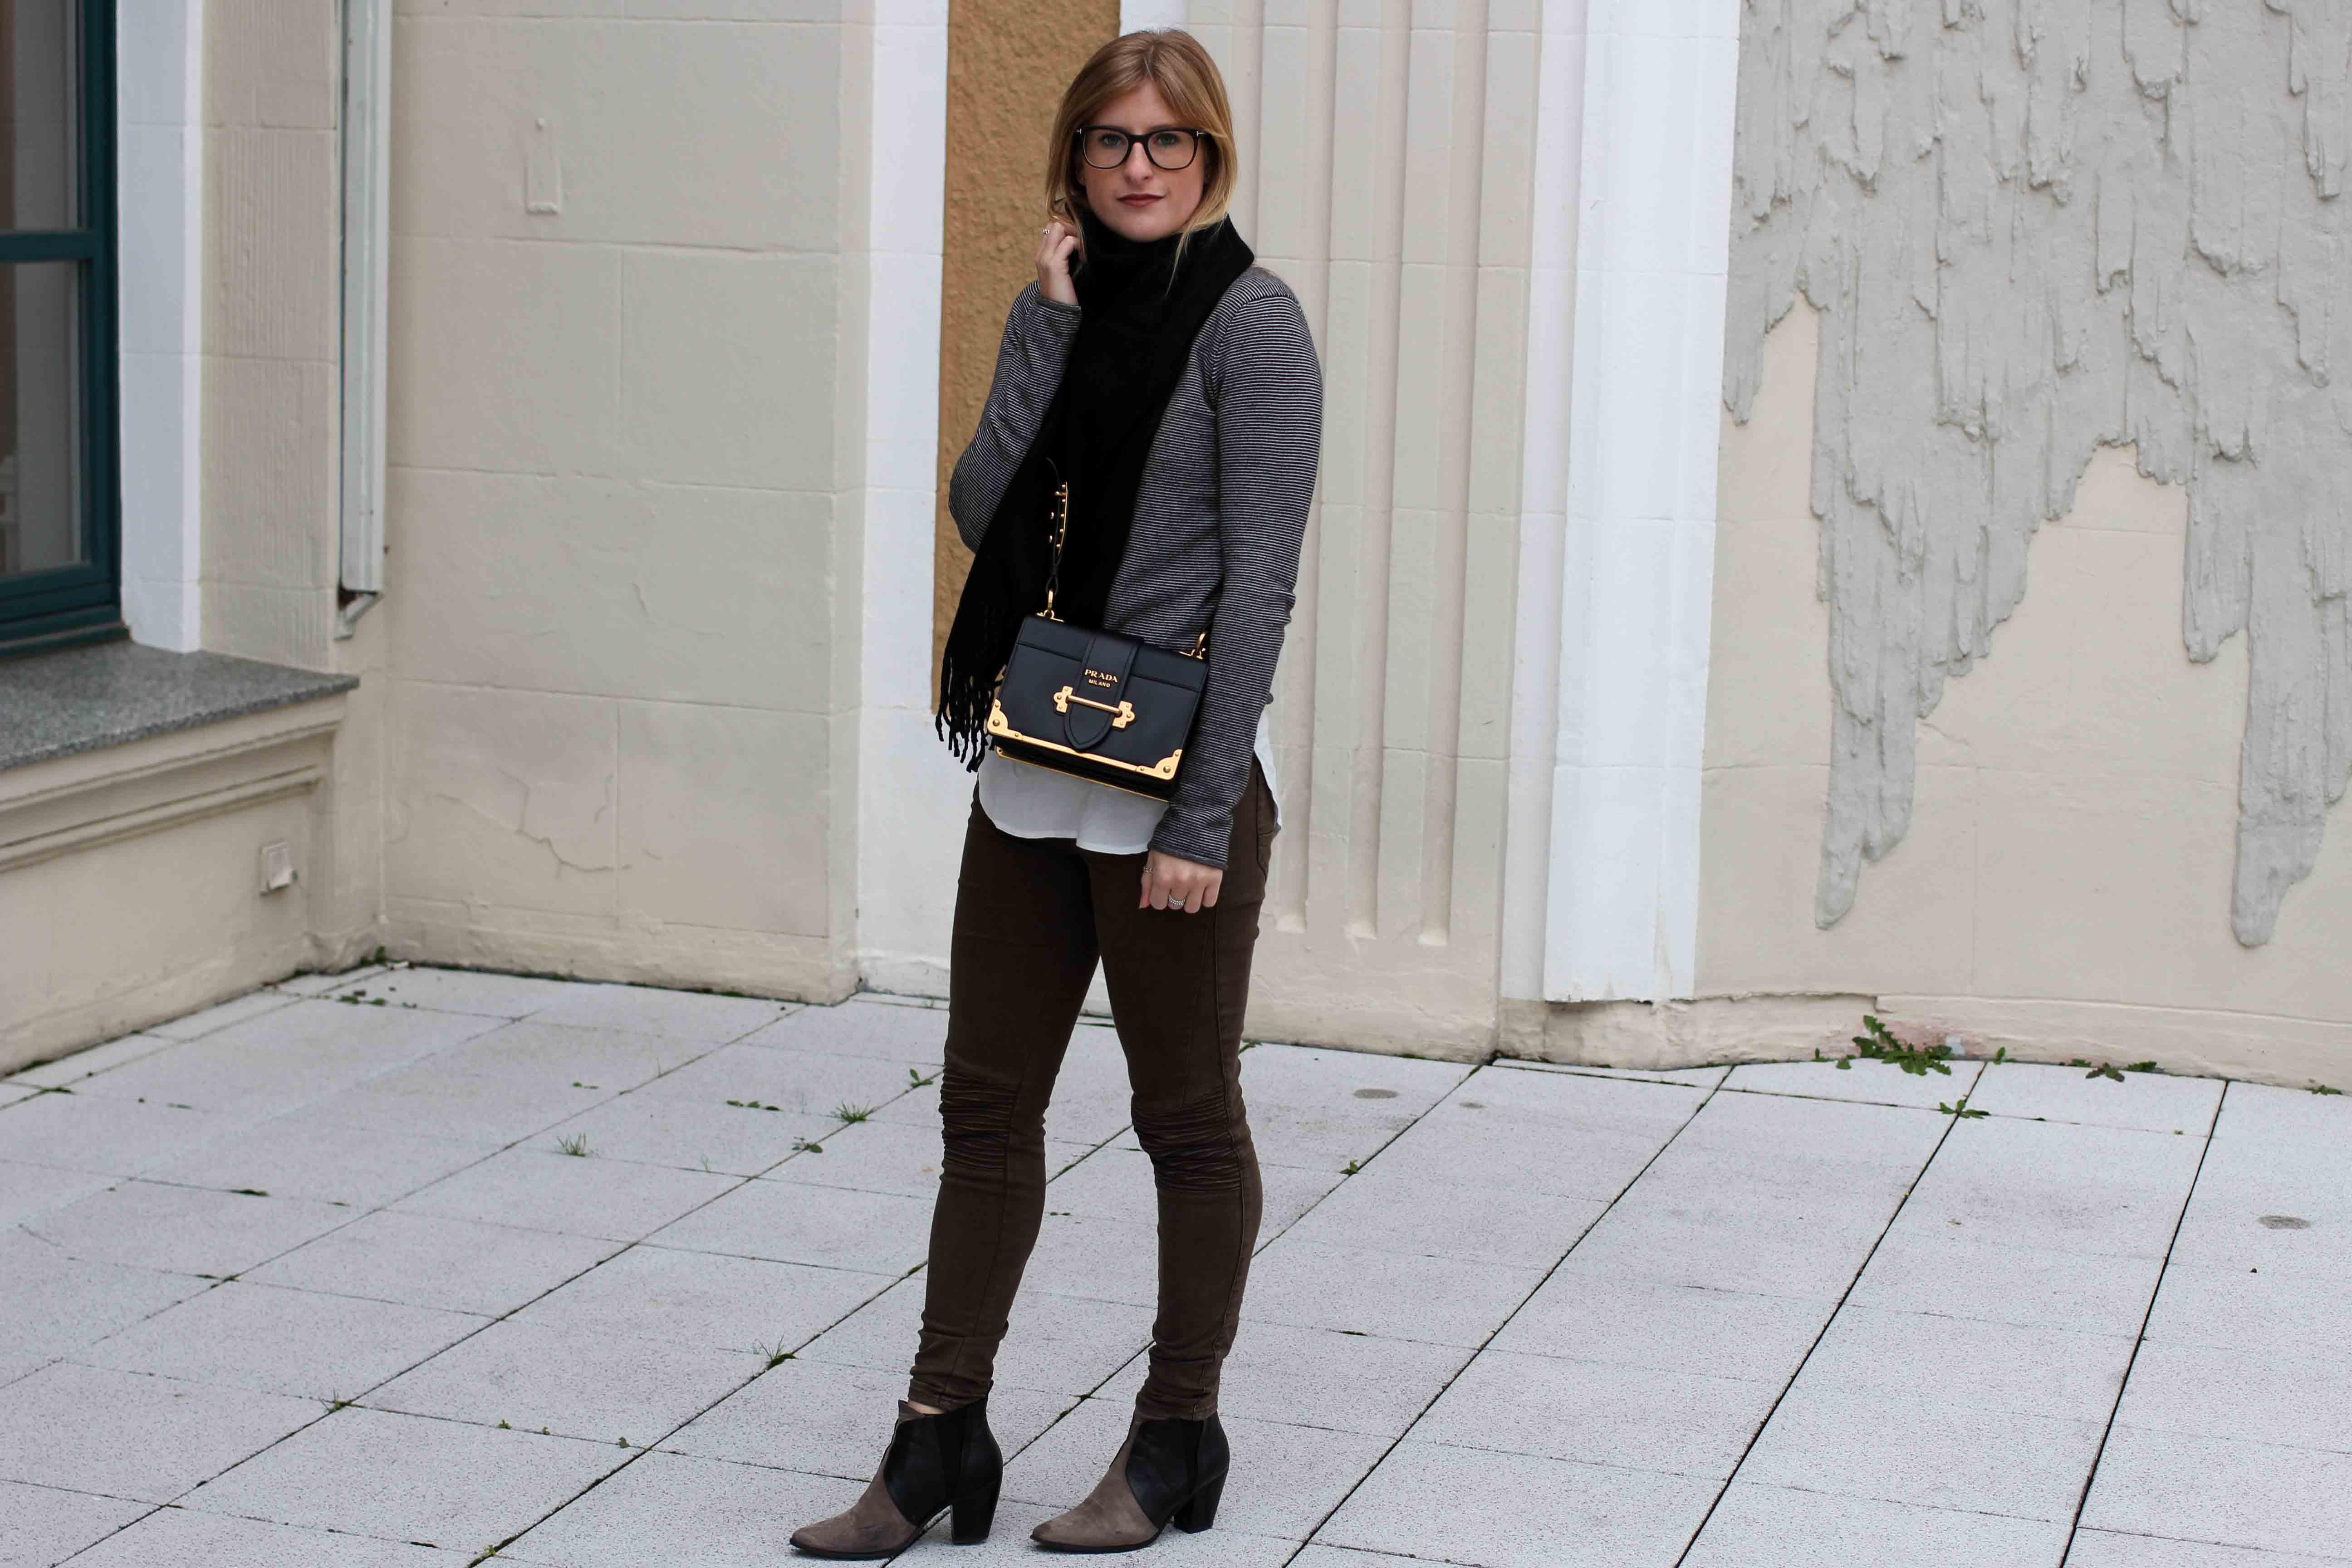 Casual Jeans Look Zara Pullover Schal Winteroutfit Prada Tasche schwarz Modeblogger streetstyle 3